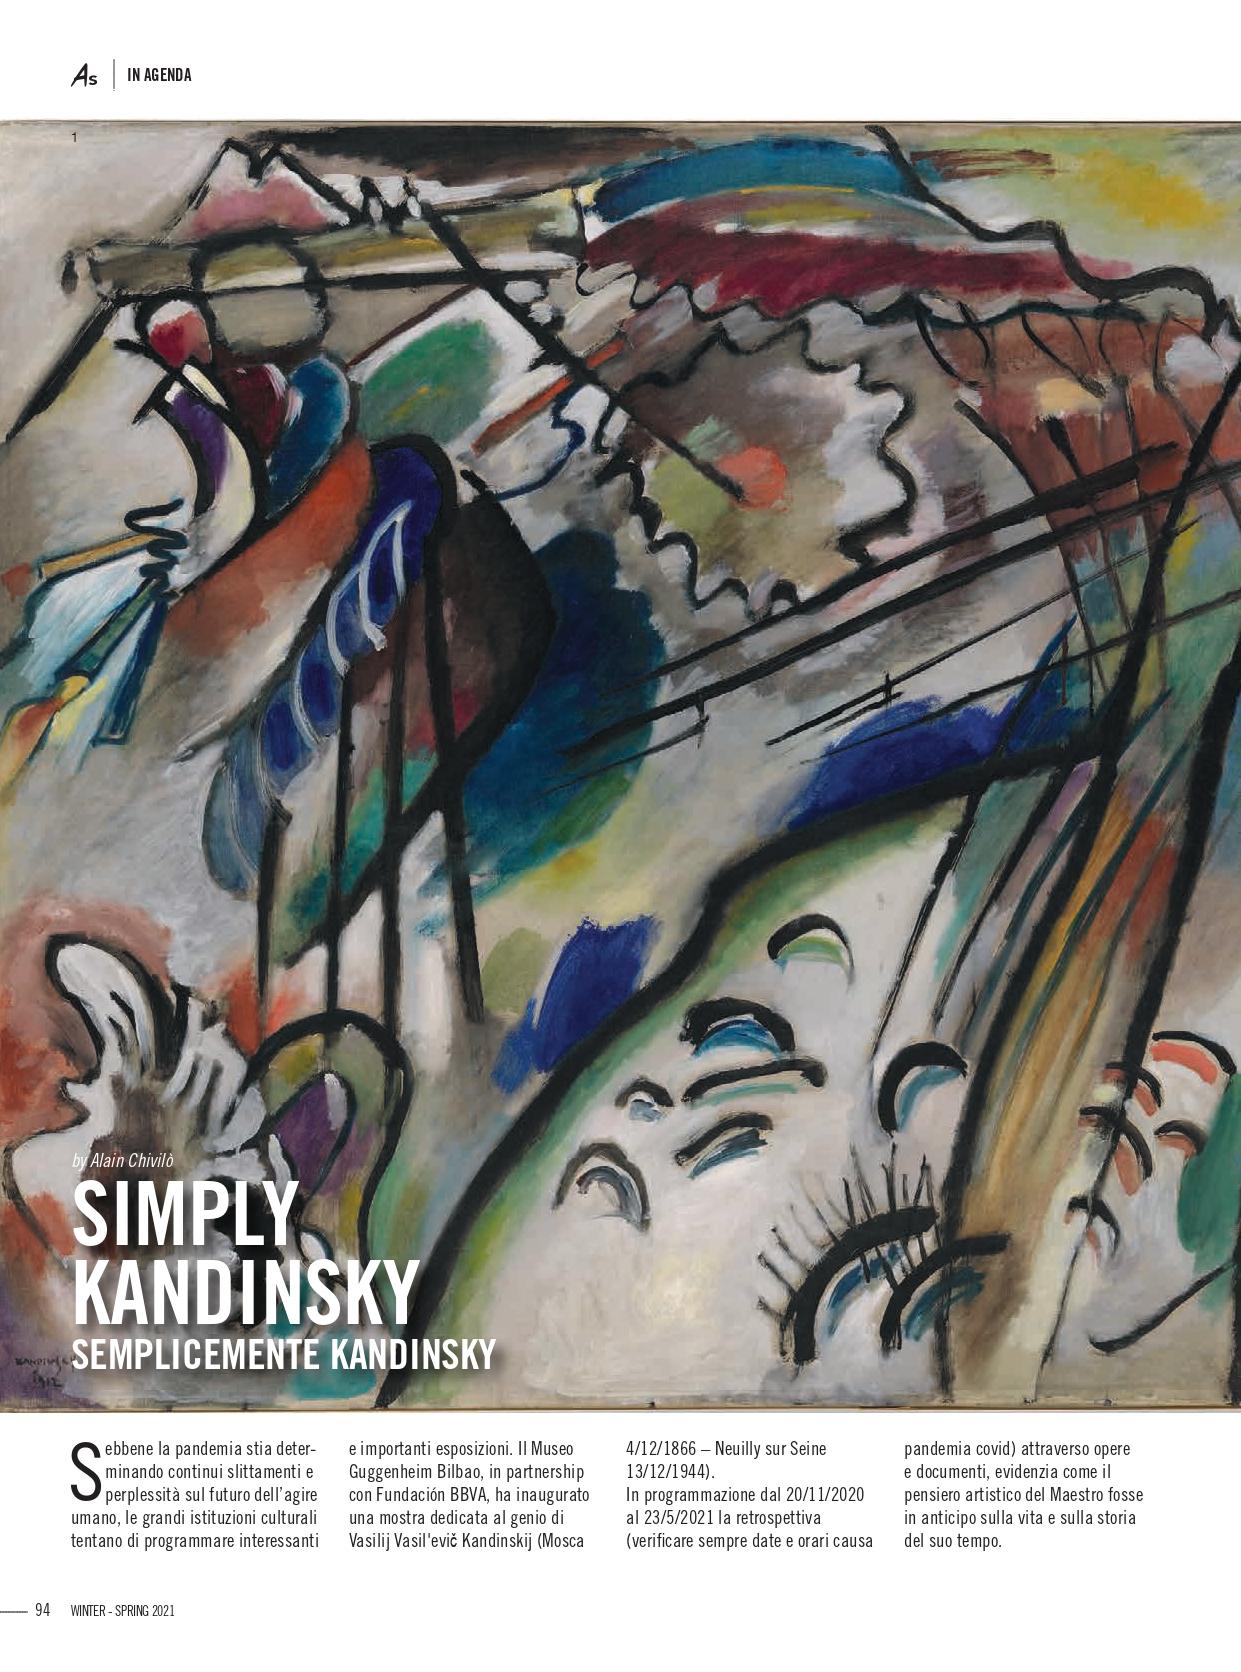 ArtStyle_Simply Kandinsky_by Alain Chivilò_Winter 20_21_page1